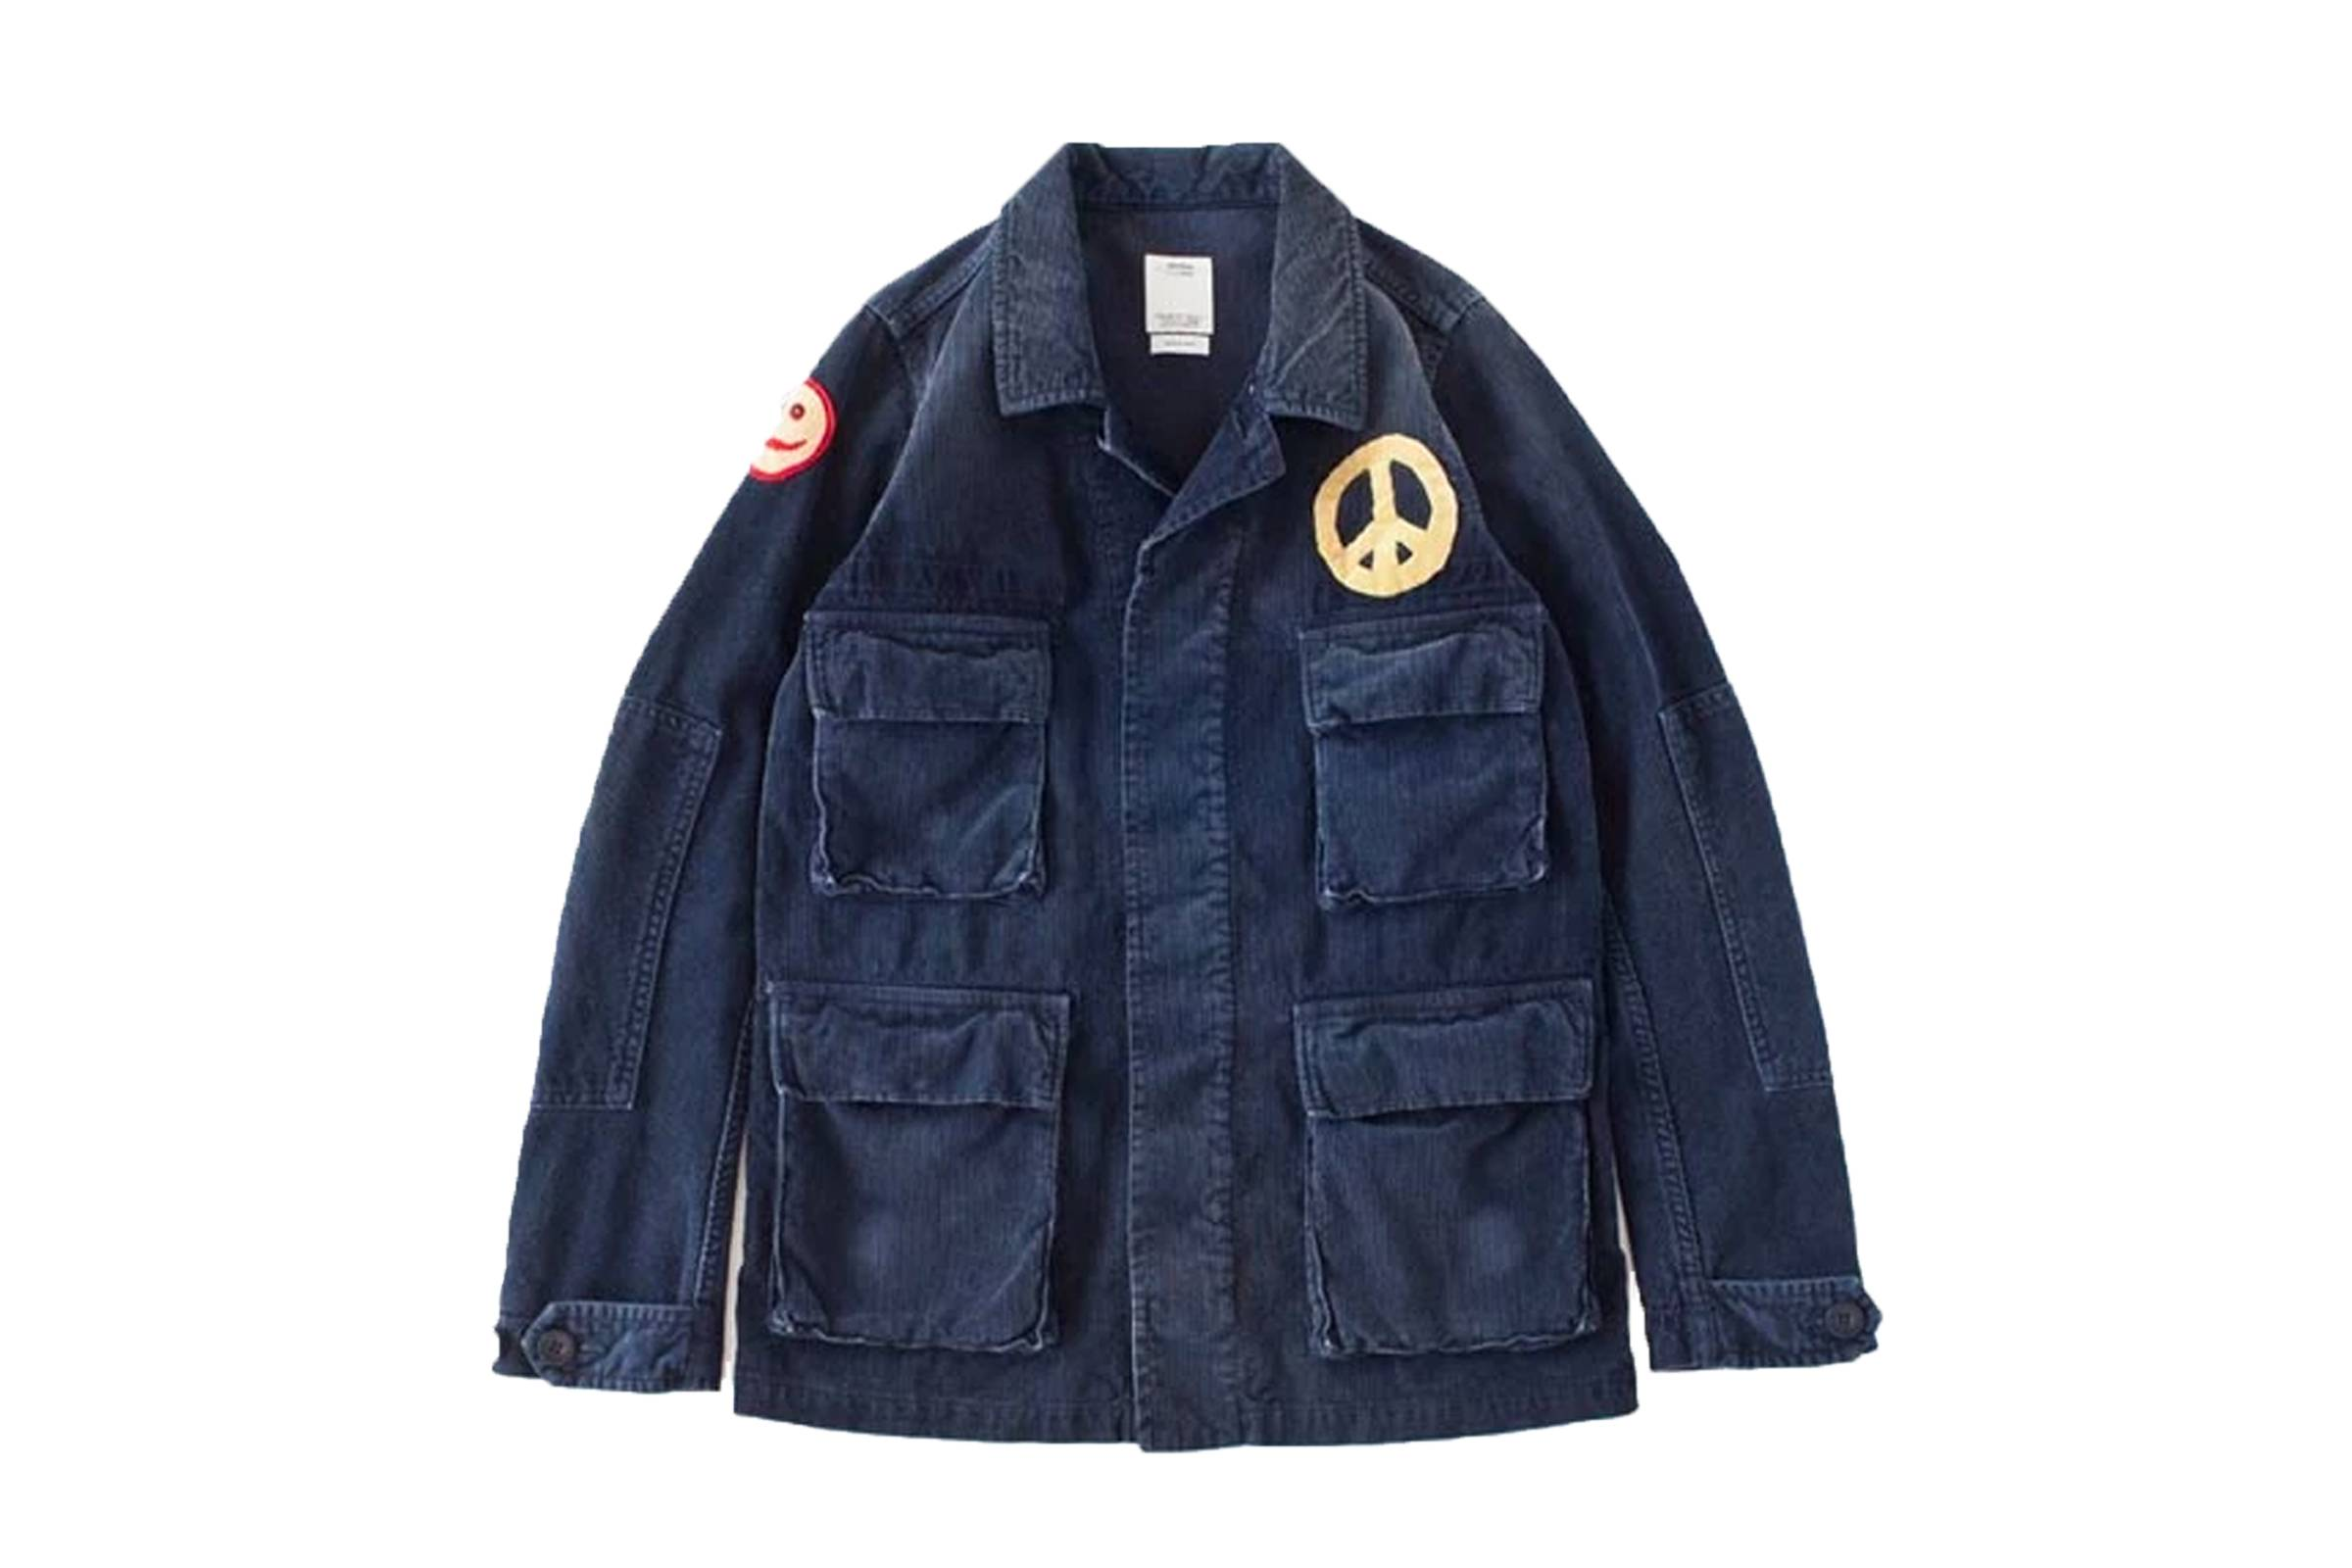 Visvim Kilgore Jacket